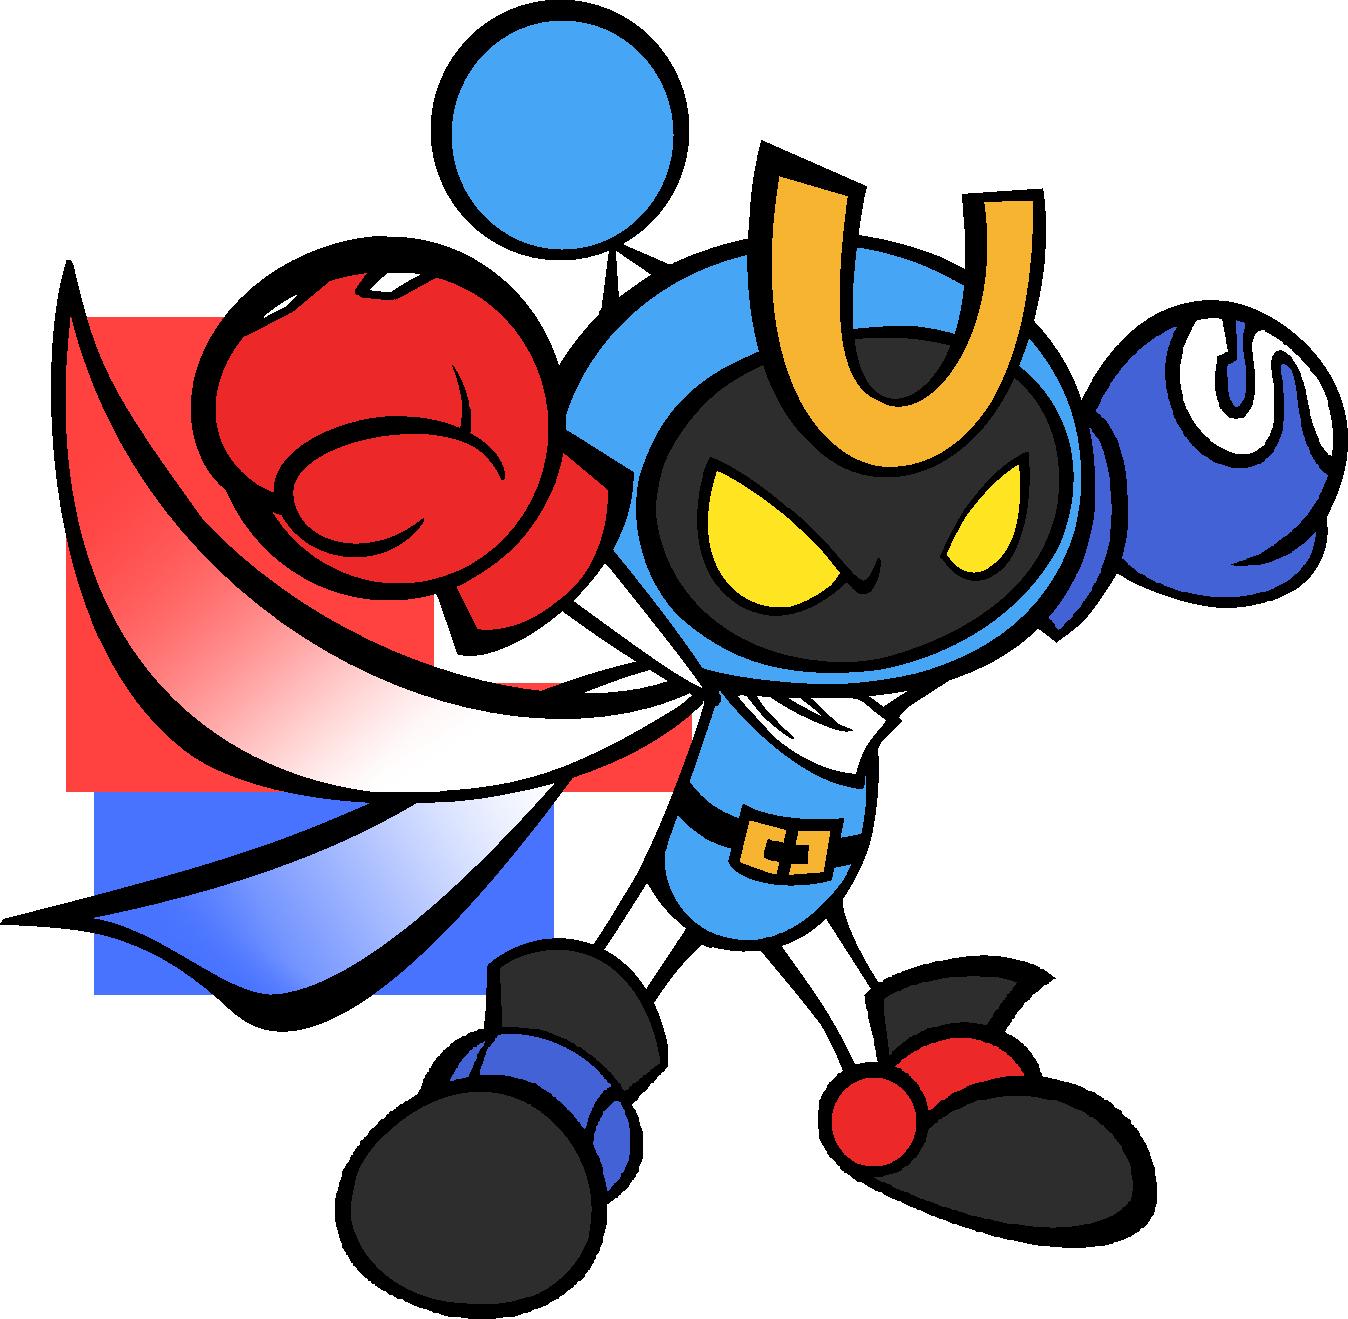 Magnet Bomber I Choose You By The Brunette Amitie On Deviantart Bomberman Art Fan Art I Choose You